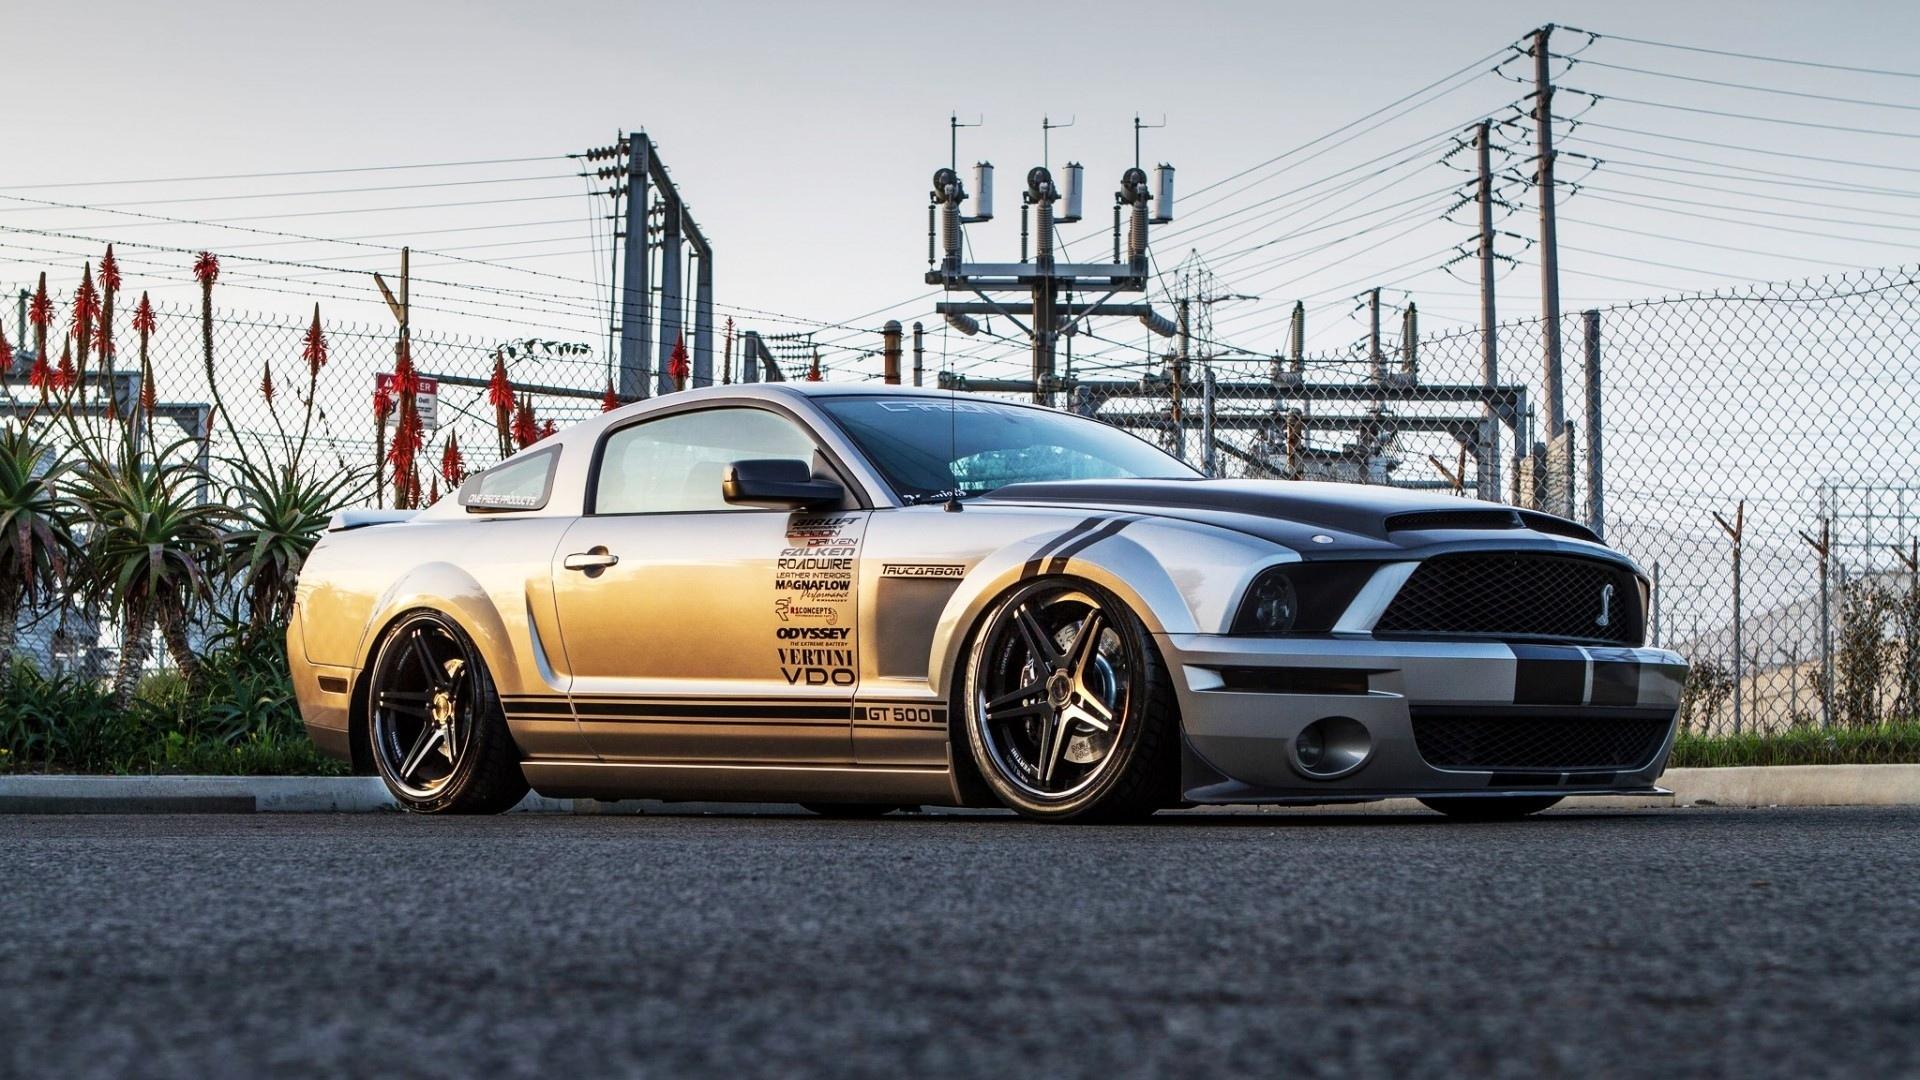 Shelby Cobra Gt500 Wallpaper Hd 44661 1920x1080px